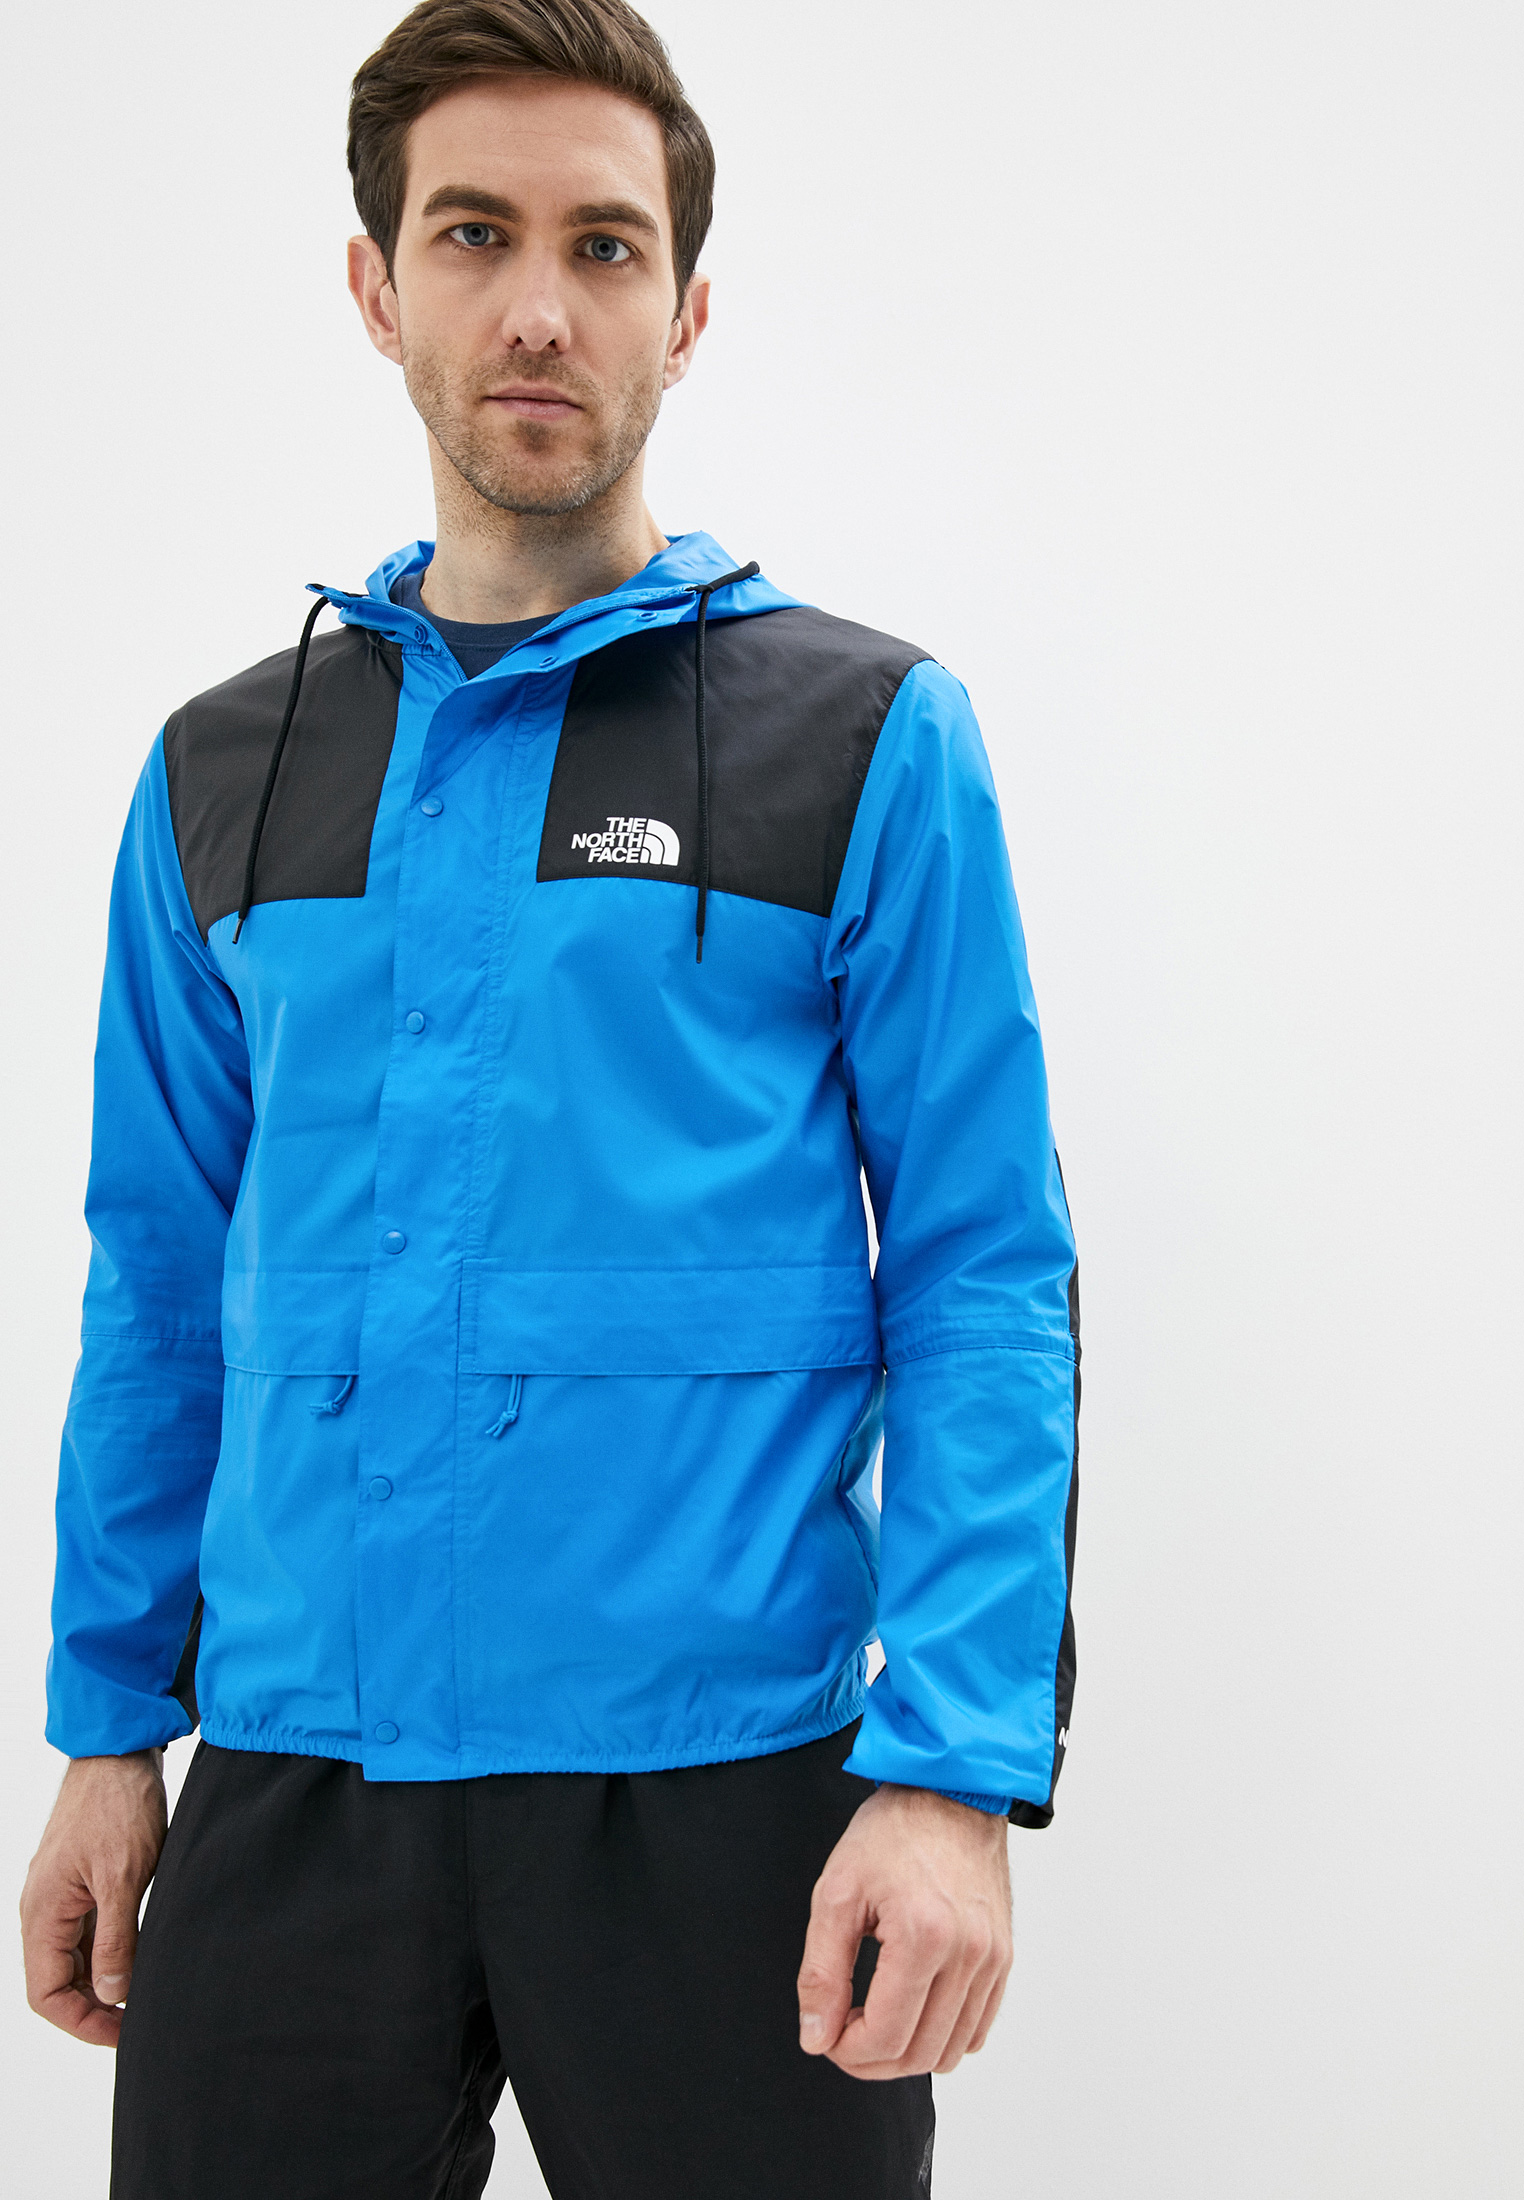 Мужская верхняя одежда The North Face (Зе Норт Фейс) T0CH37W8G